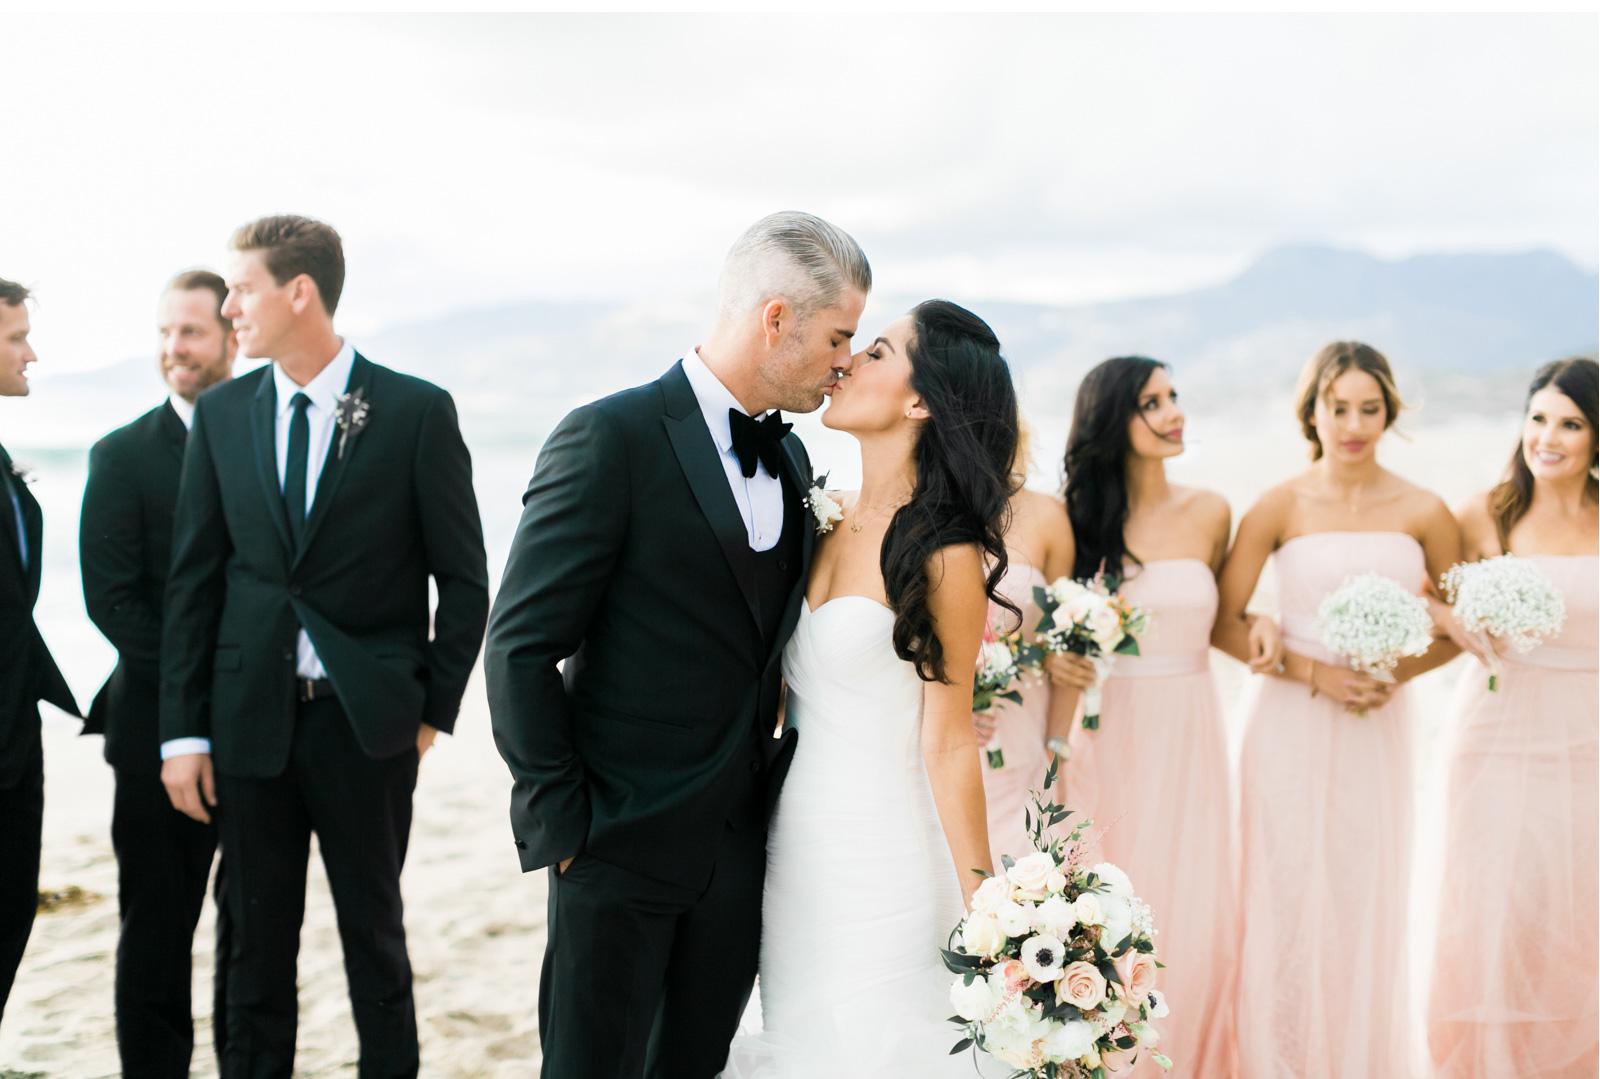 Rod-and-Lorin-Brewster-Style-Me-Pretty-Malibu-Beach-Wedding-Natalie-Schutt-Photography_21.jpg